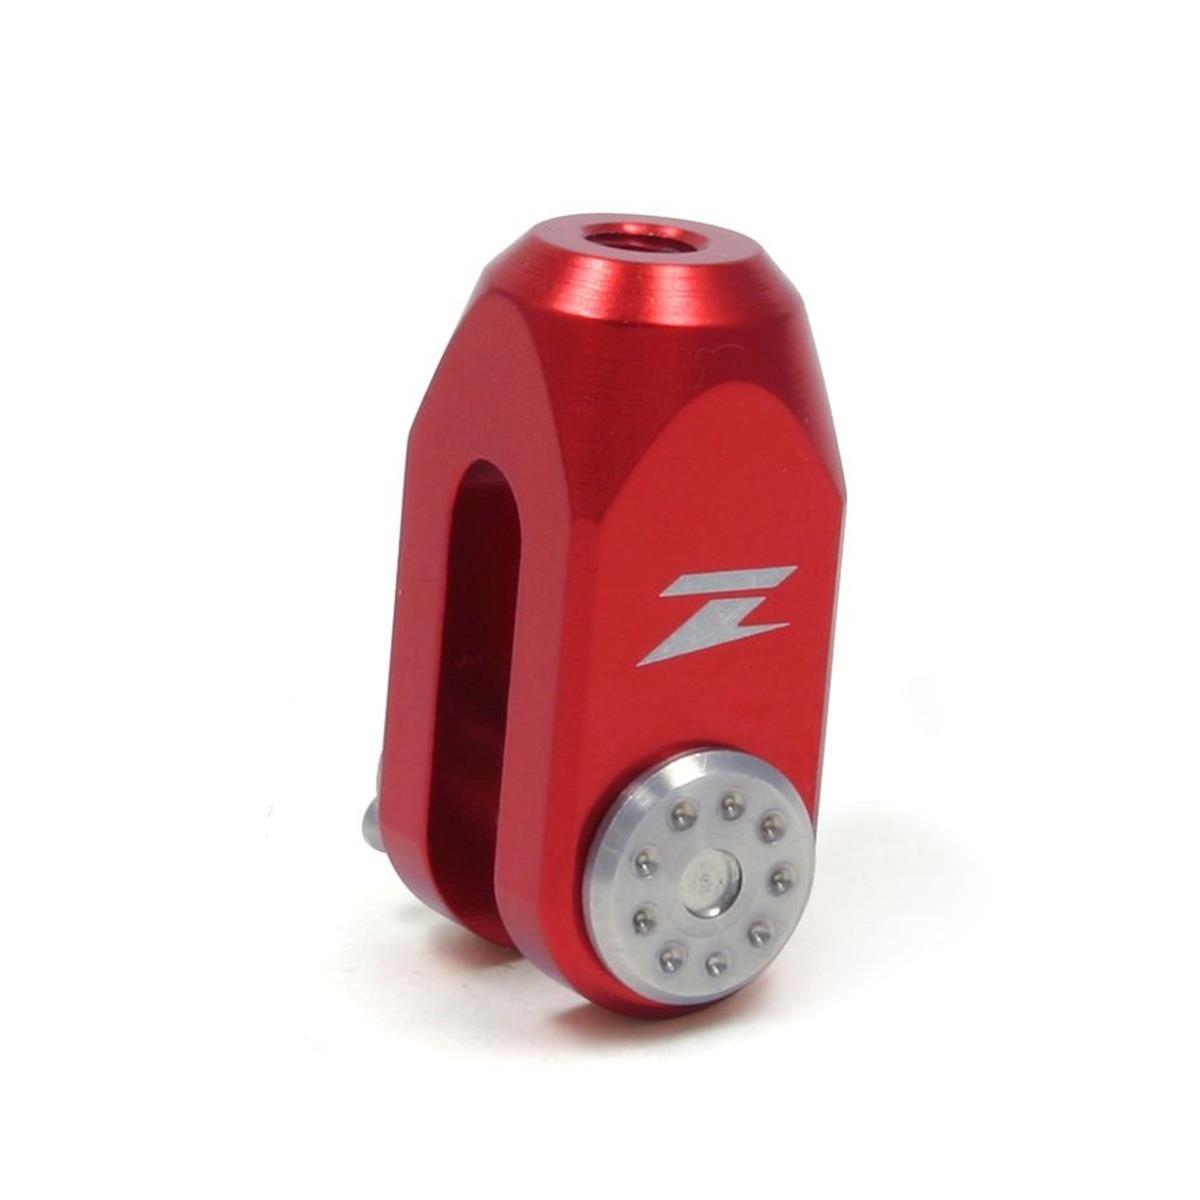 Zeta Hinterradbremsen-Einsteller  Rot, Honda CR 125/250, CRF 150/250/450, CRF-X 250/450